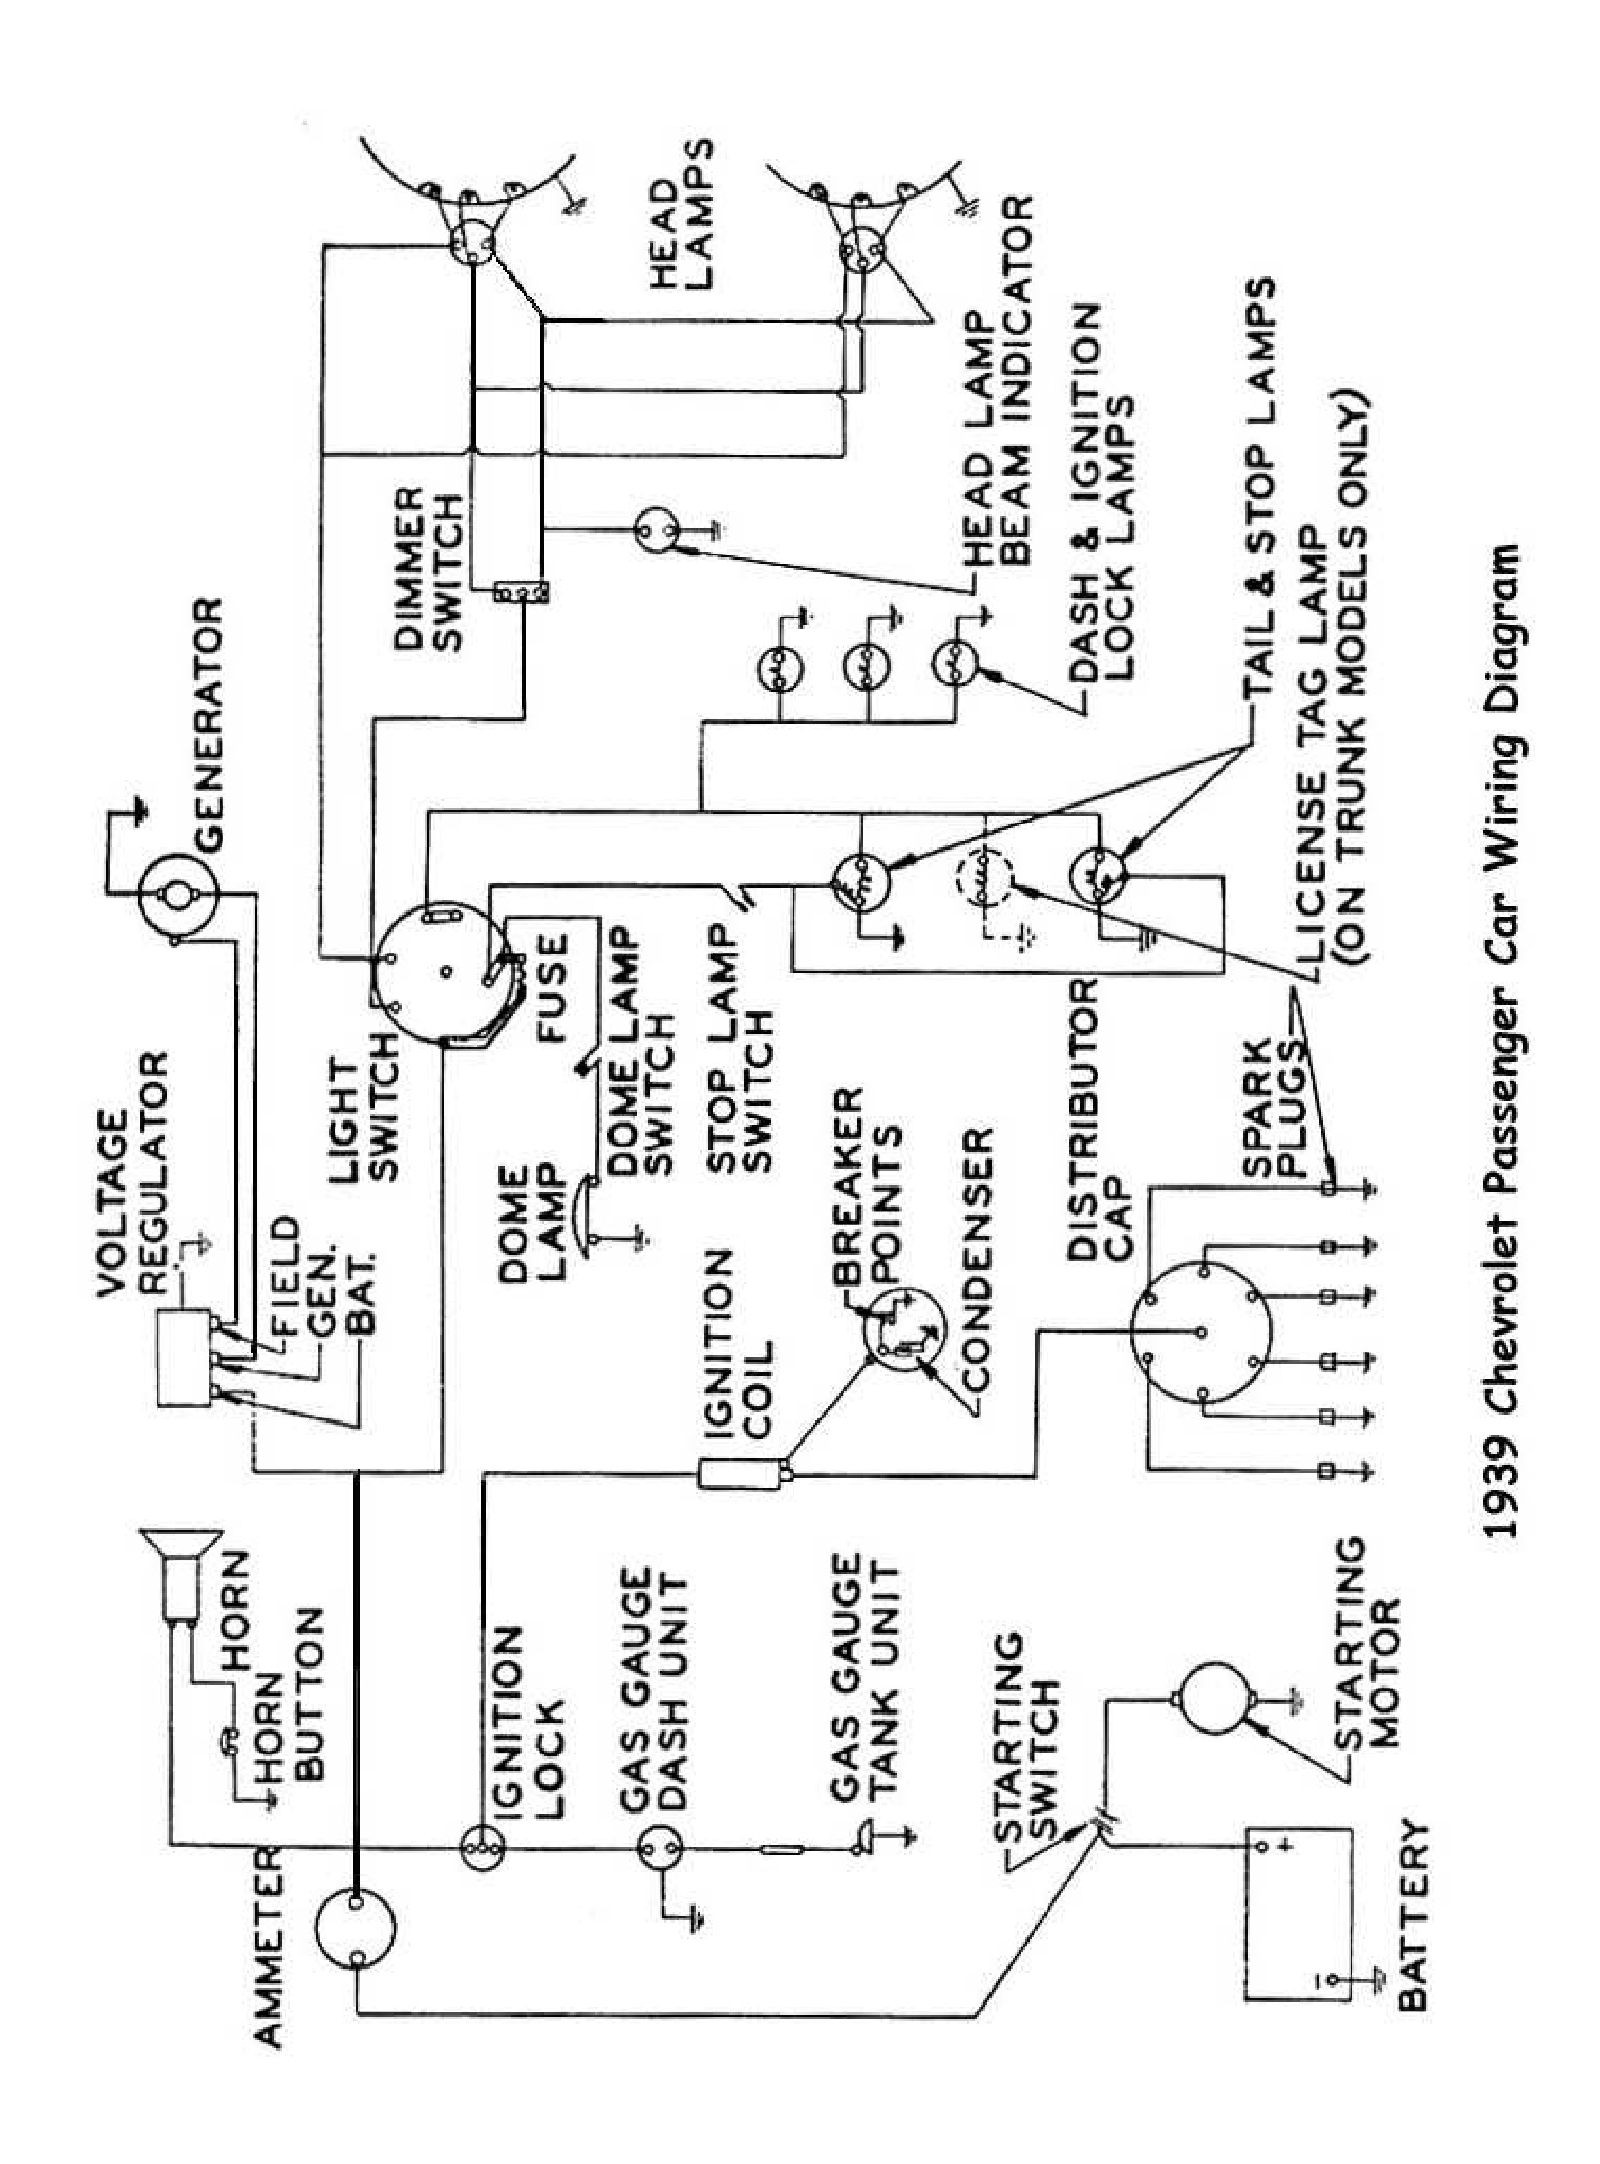 hight resolution of 65 chevy alternator wiring diagram